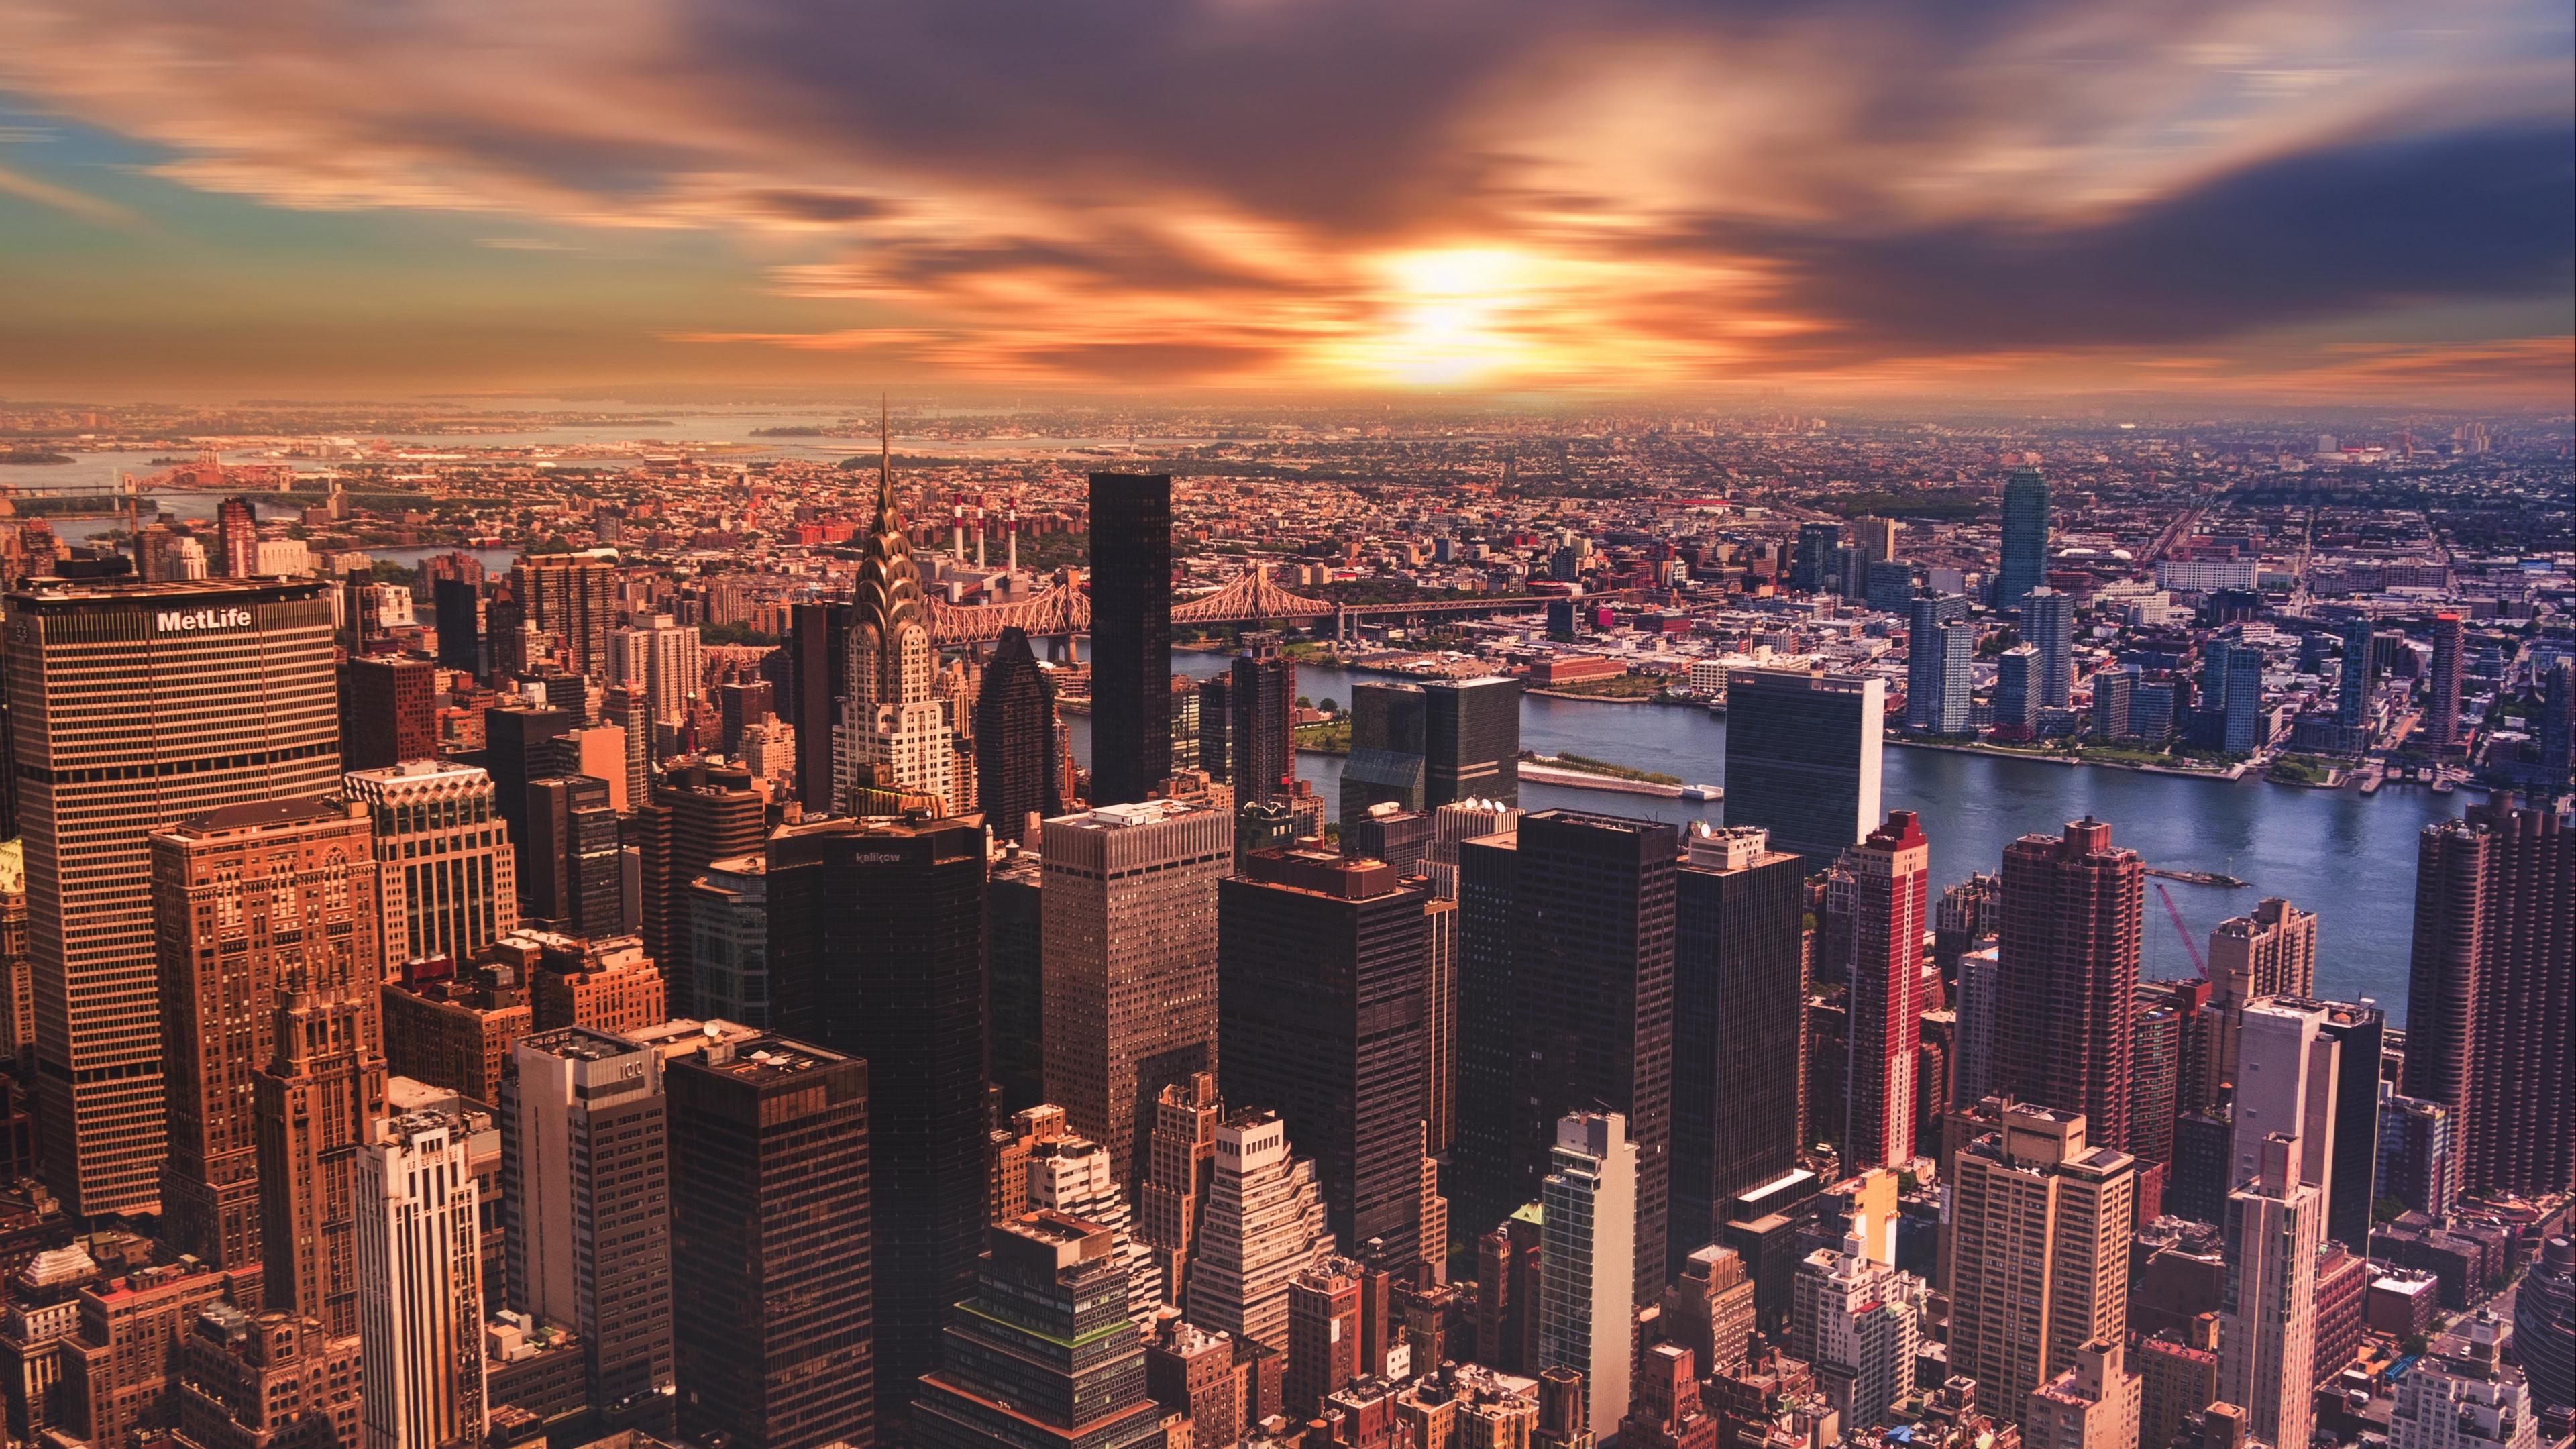 new york skyscrapers sunset metropolis 4k 1538067517 - new york, skyscrapers, sunset, metropolis 4k - sunset, Skyscrapers, new york